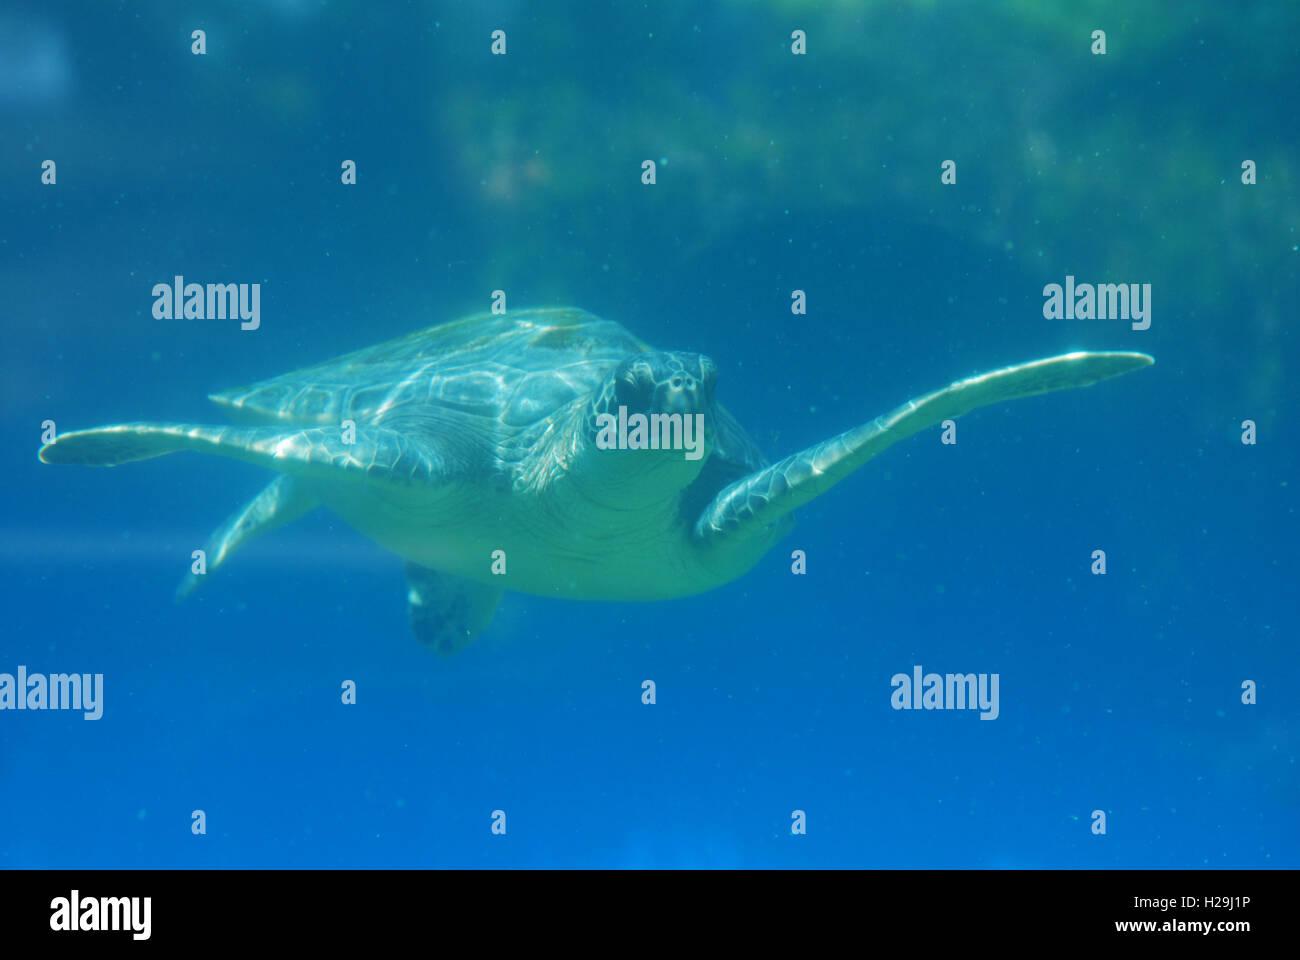 Sea turtle gliding along underwater in the deep blue ocean. - Stock Image